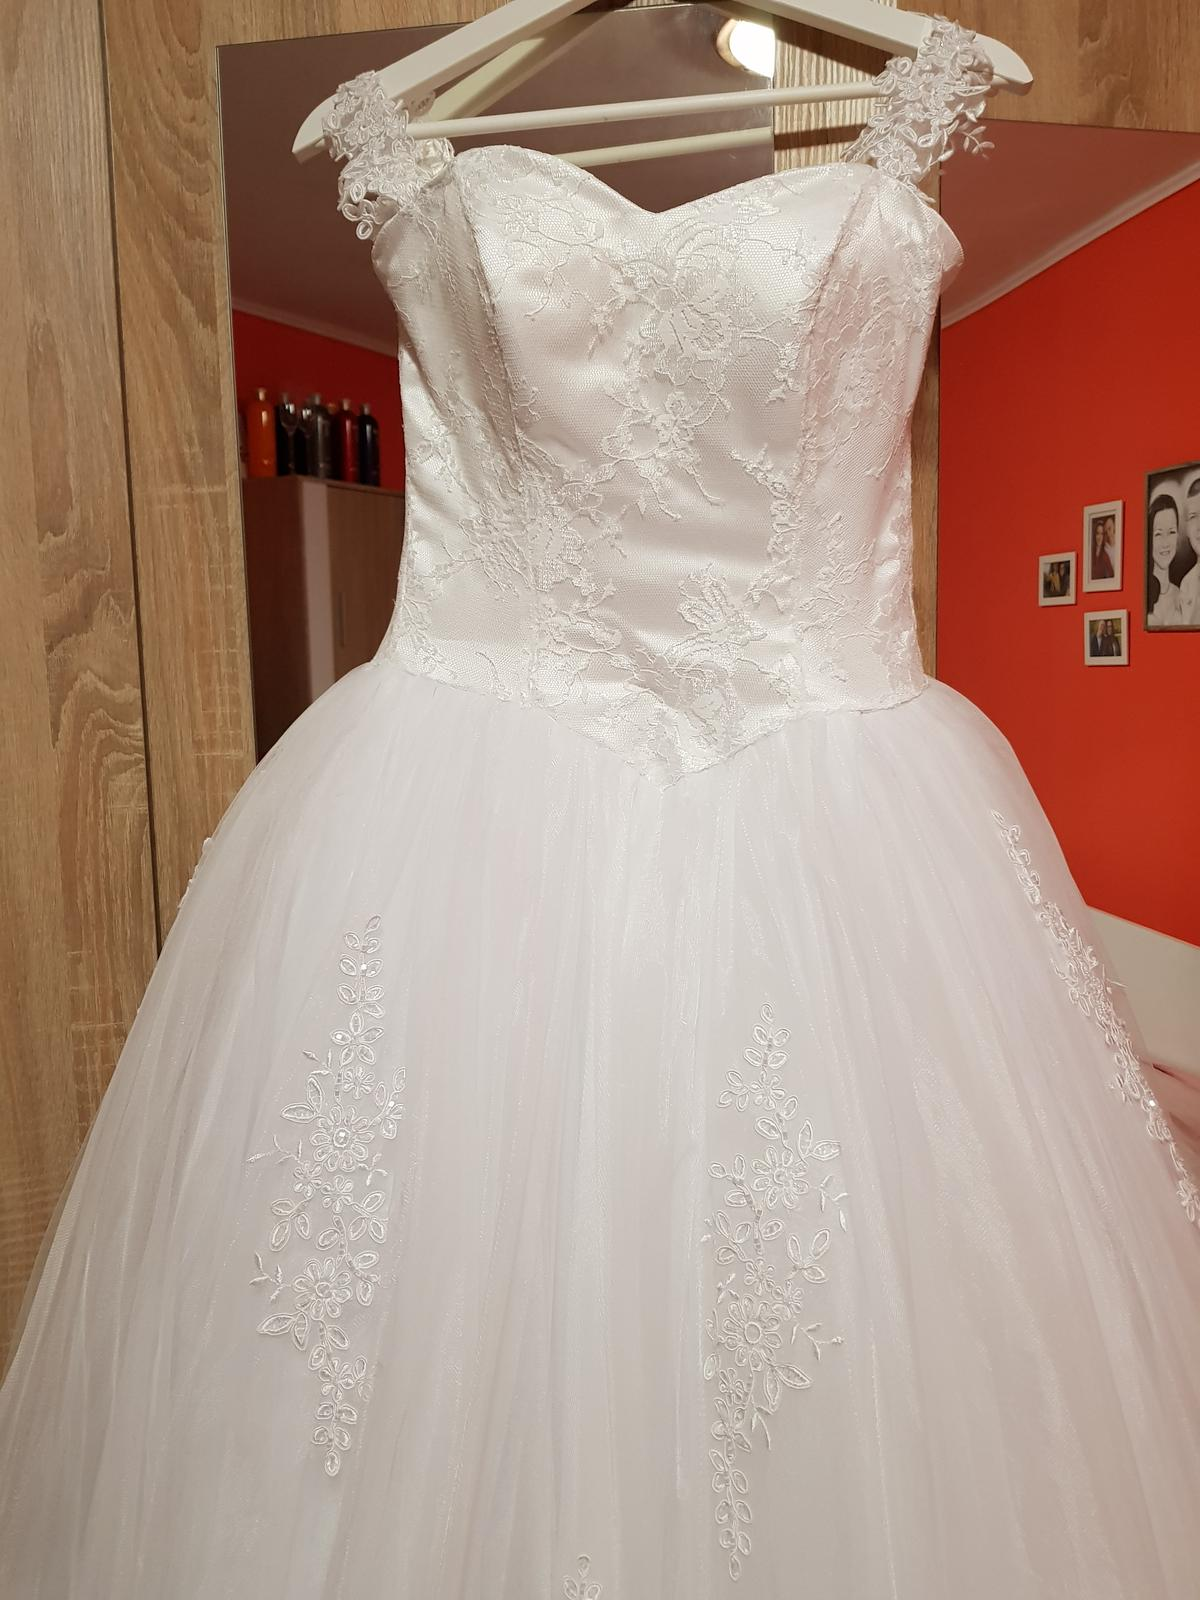 83f1a5deec6b Svadobné šaty xs-s